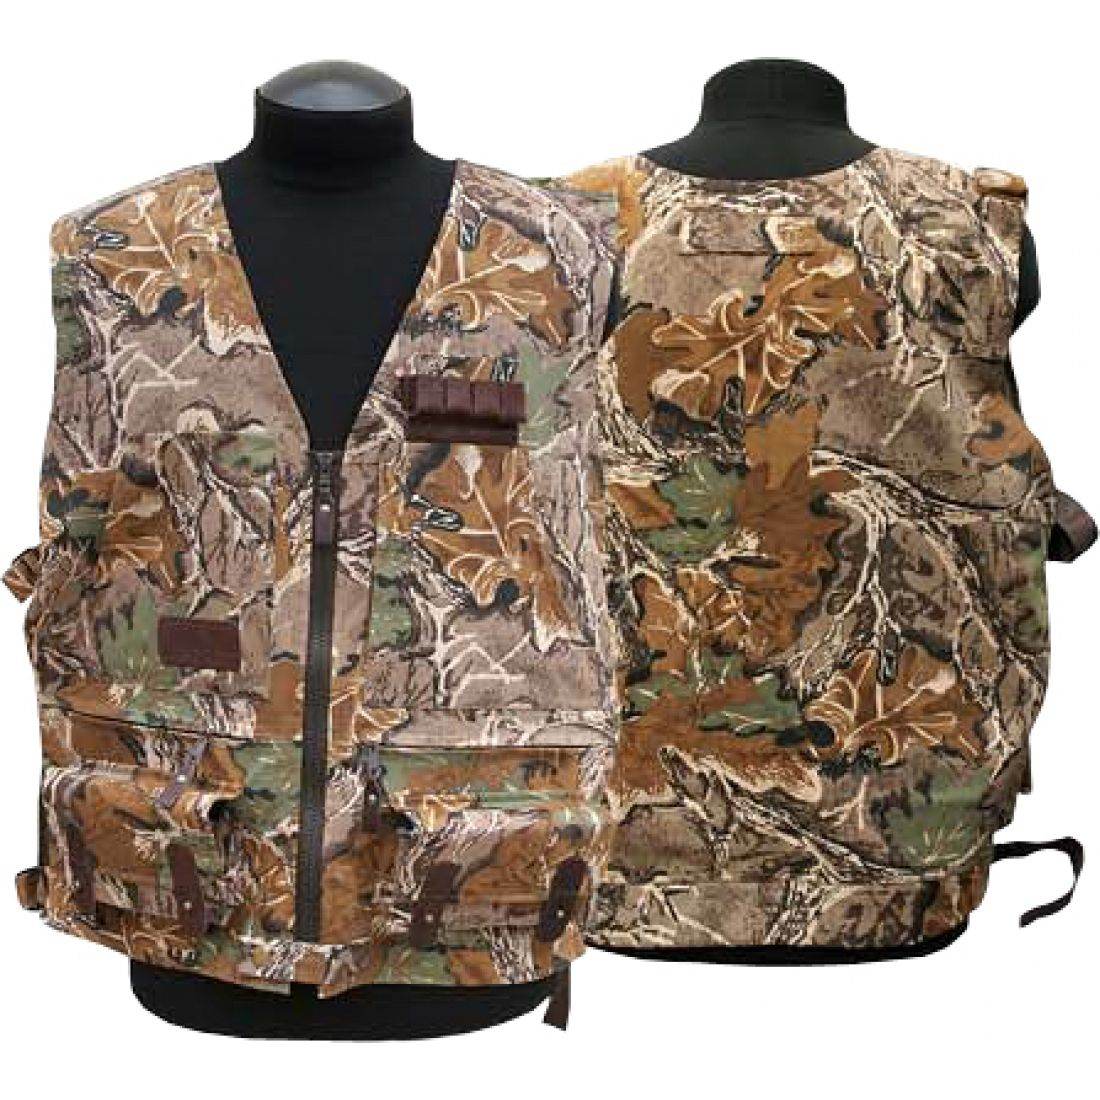 Зимняя камуфляжная одежда для охоты